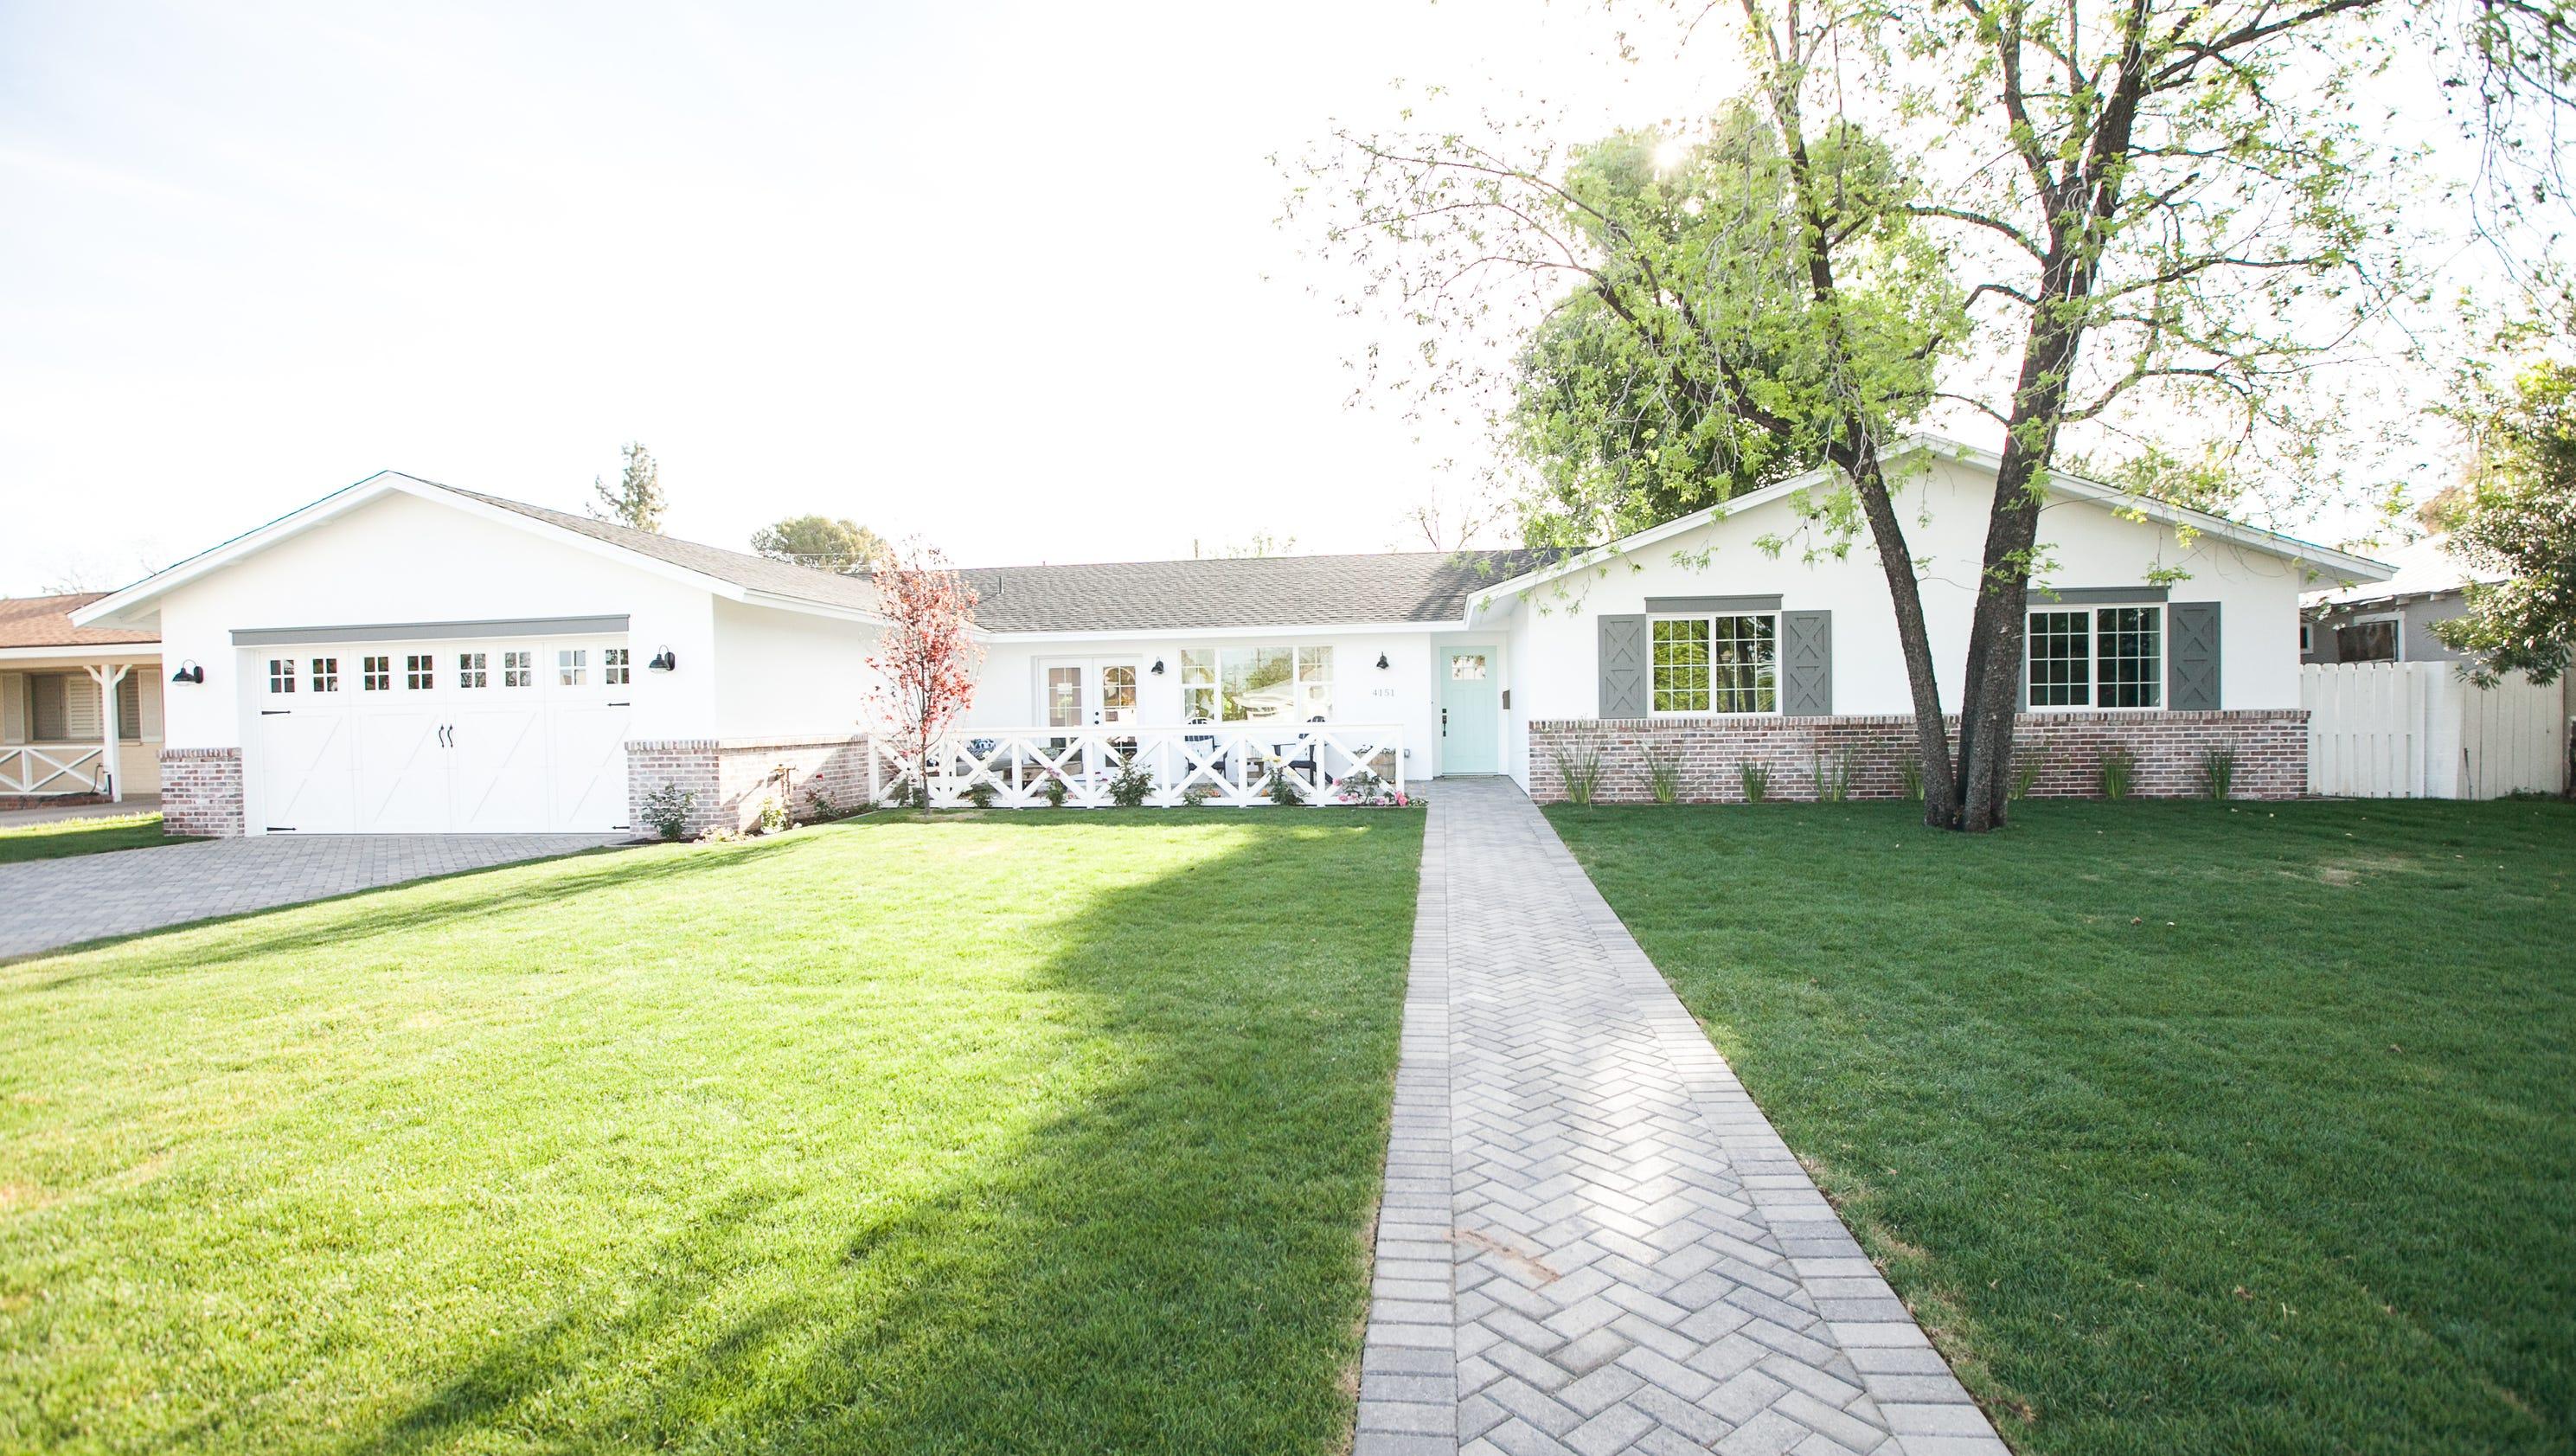 Popular Phoenixarea Home Tours Through December - Phoenix home design